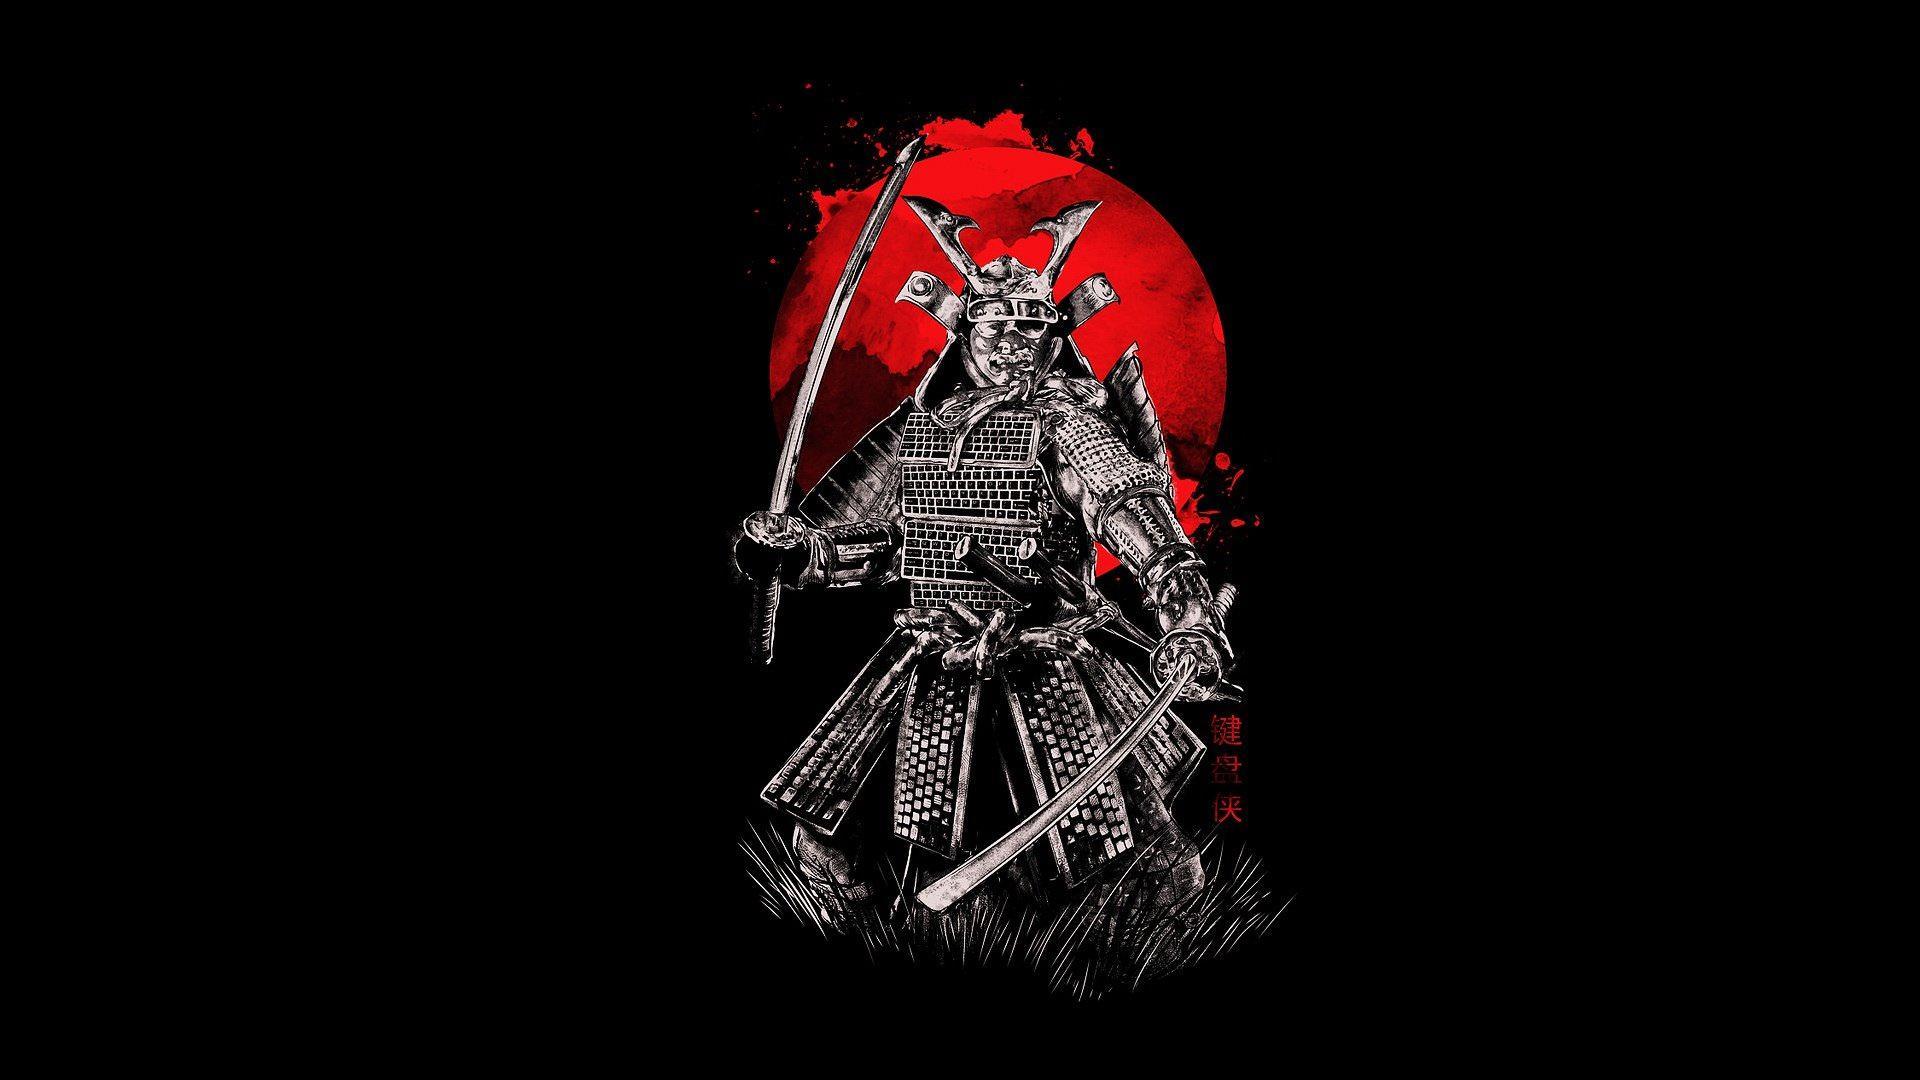 Best Samurai Wallpapers - Top Free Best